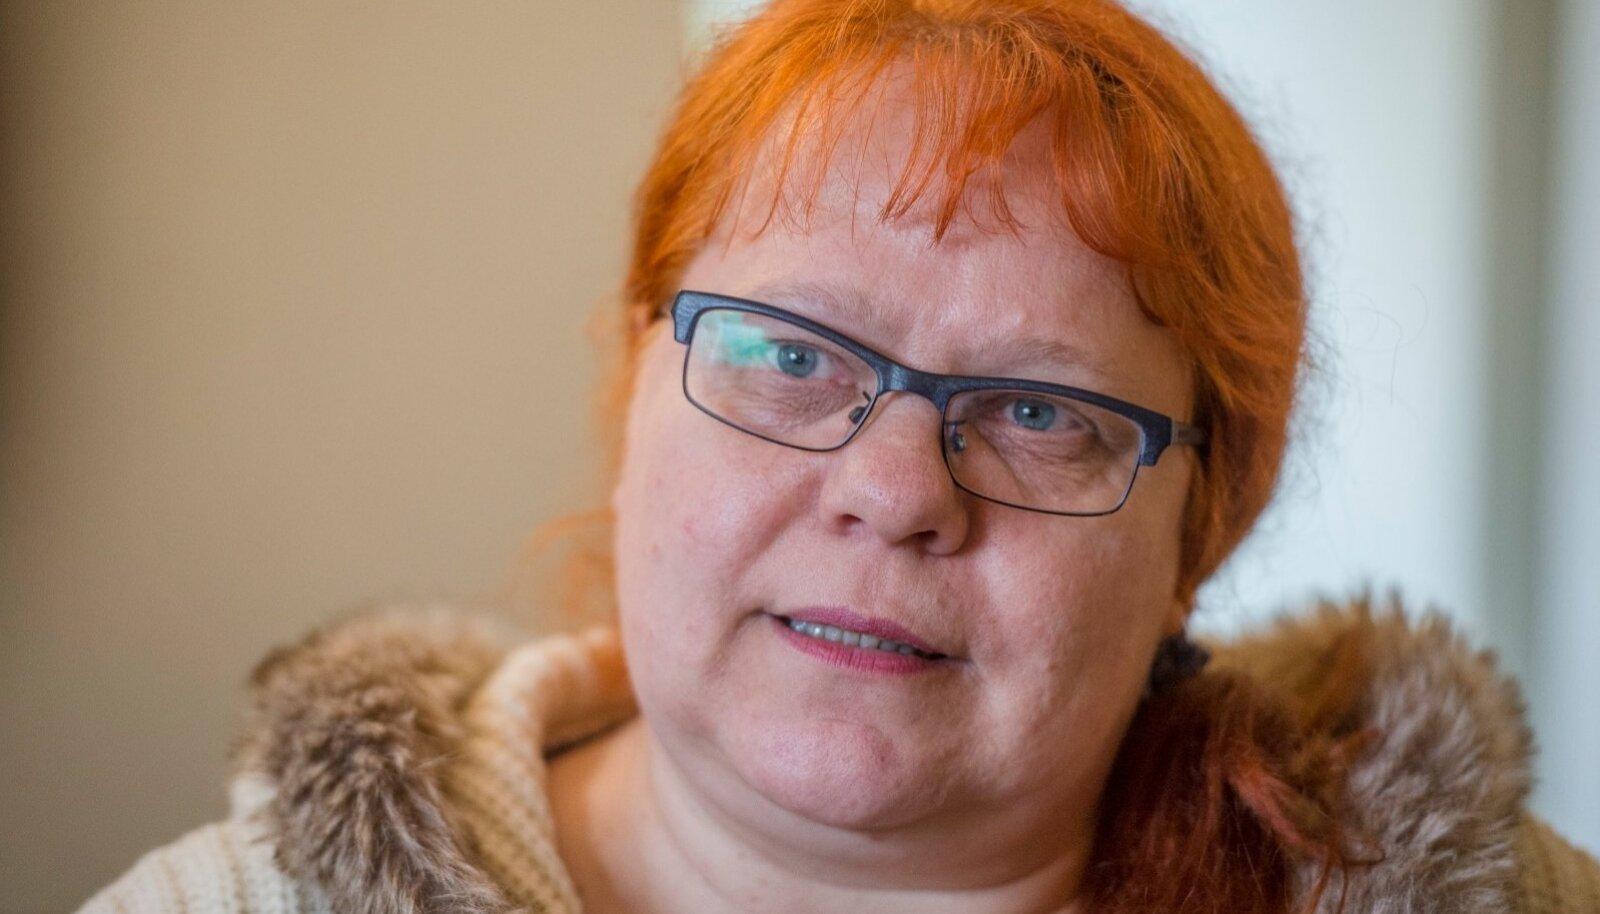 OÜ Leisi Lapikoda, Maire Forsel